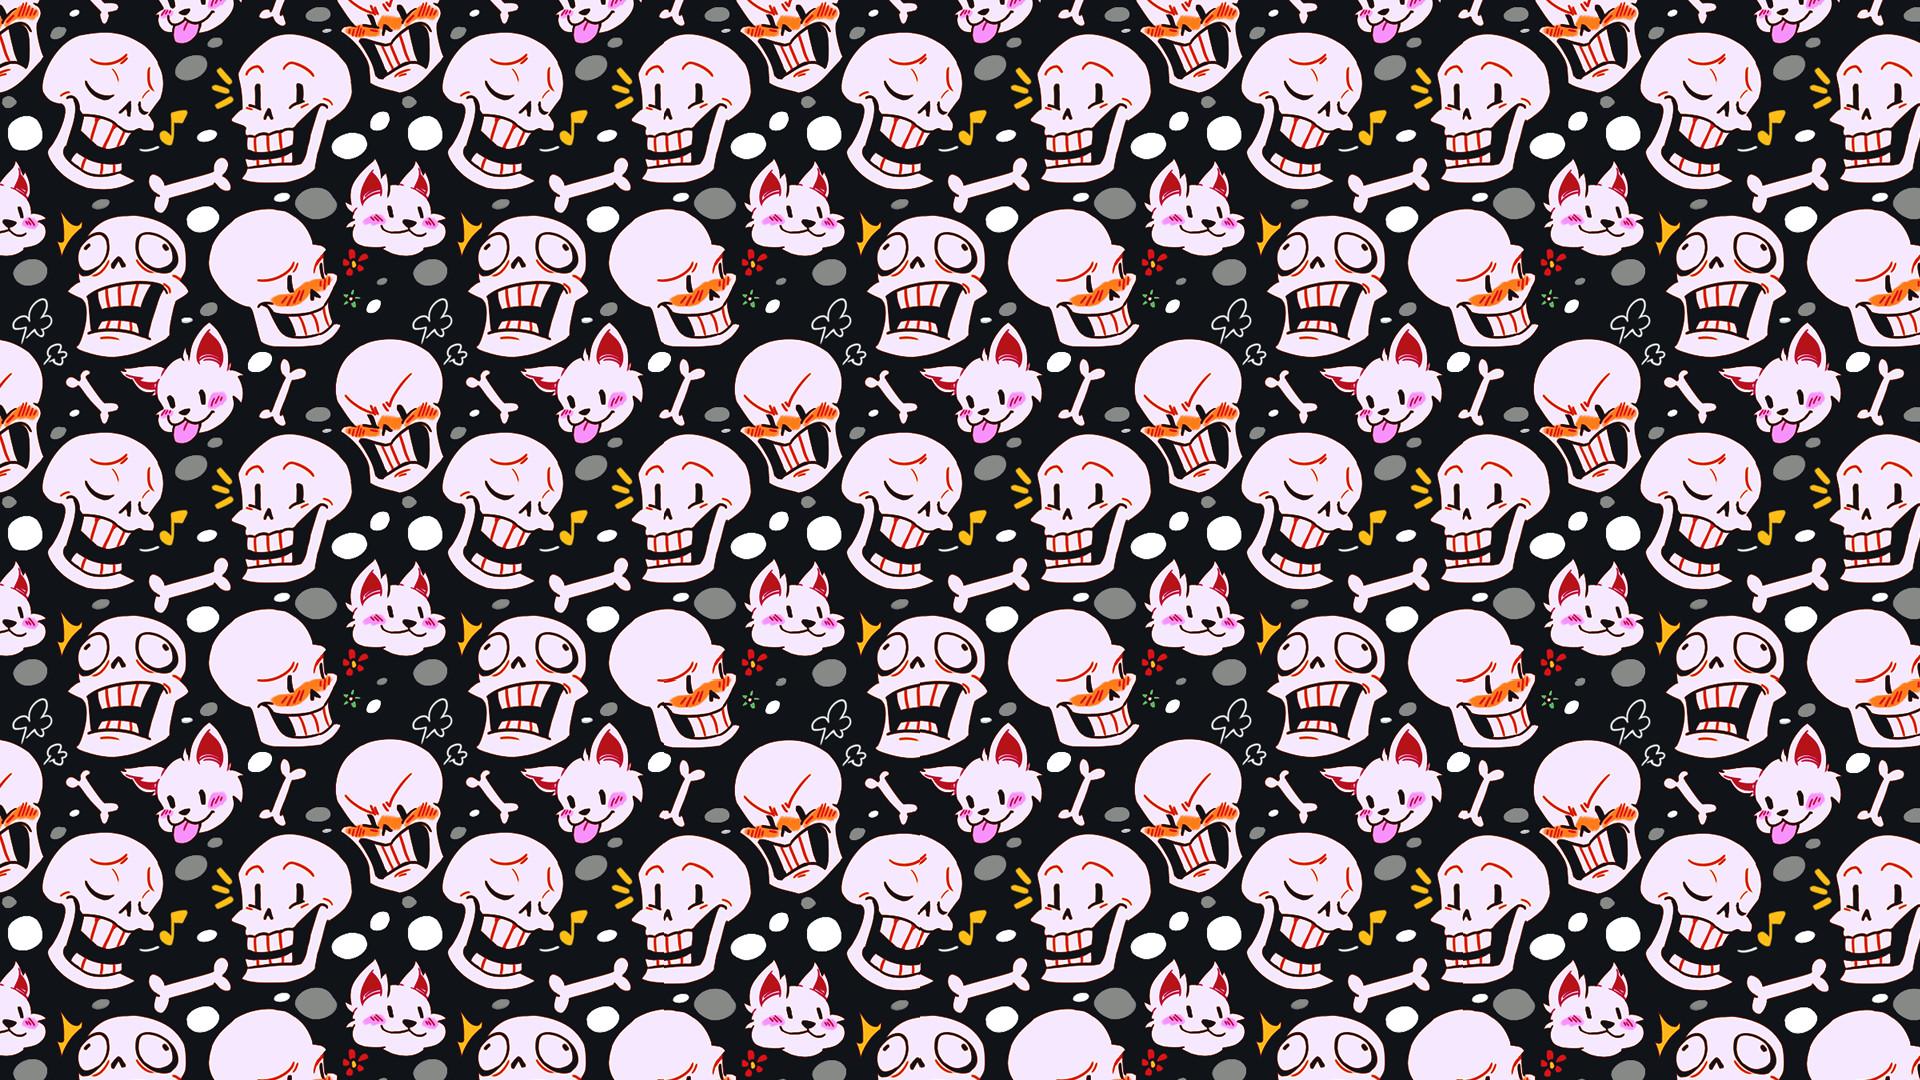 Video Game – Undertale Papyrus (Undertale) Annoying Dog (Undertale)  Wallpaper